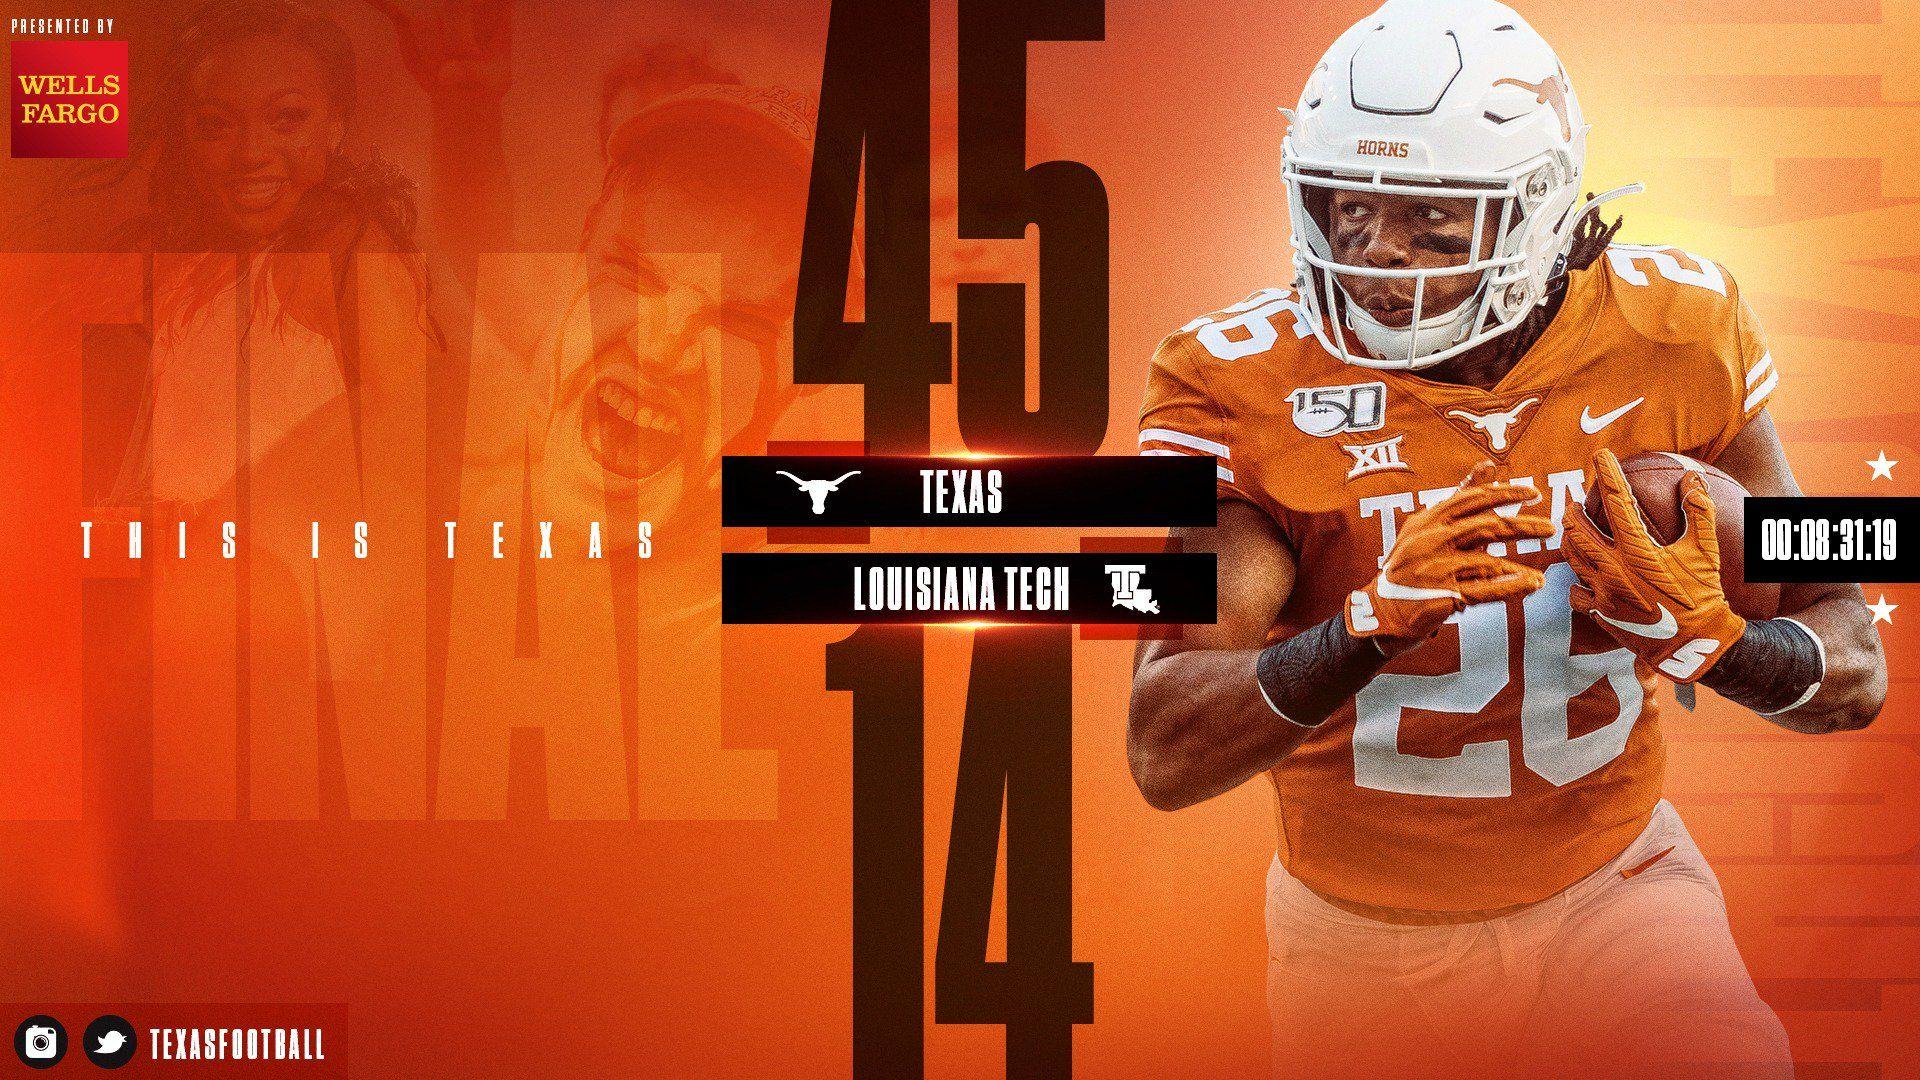 Texas Football on University of texas football, Football